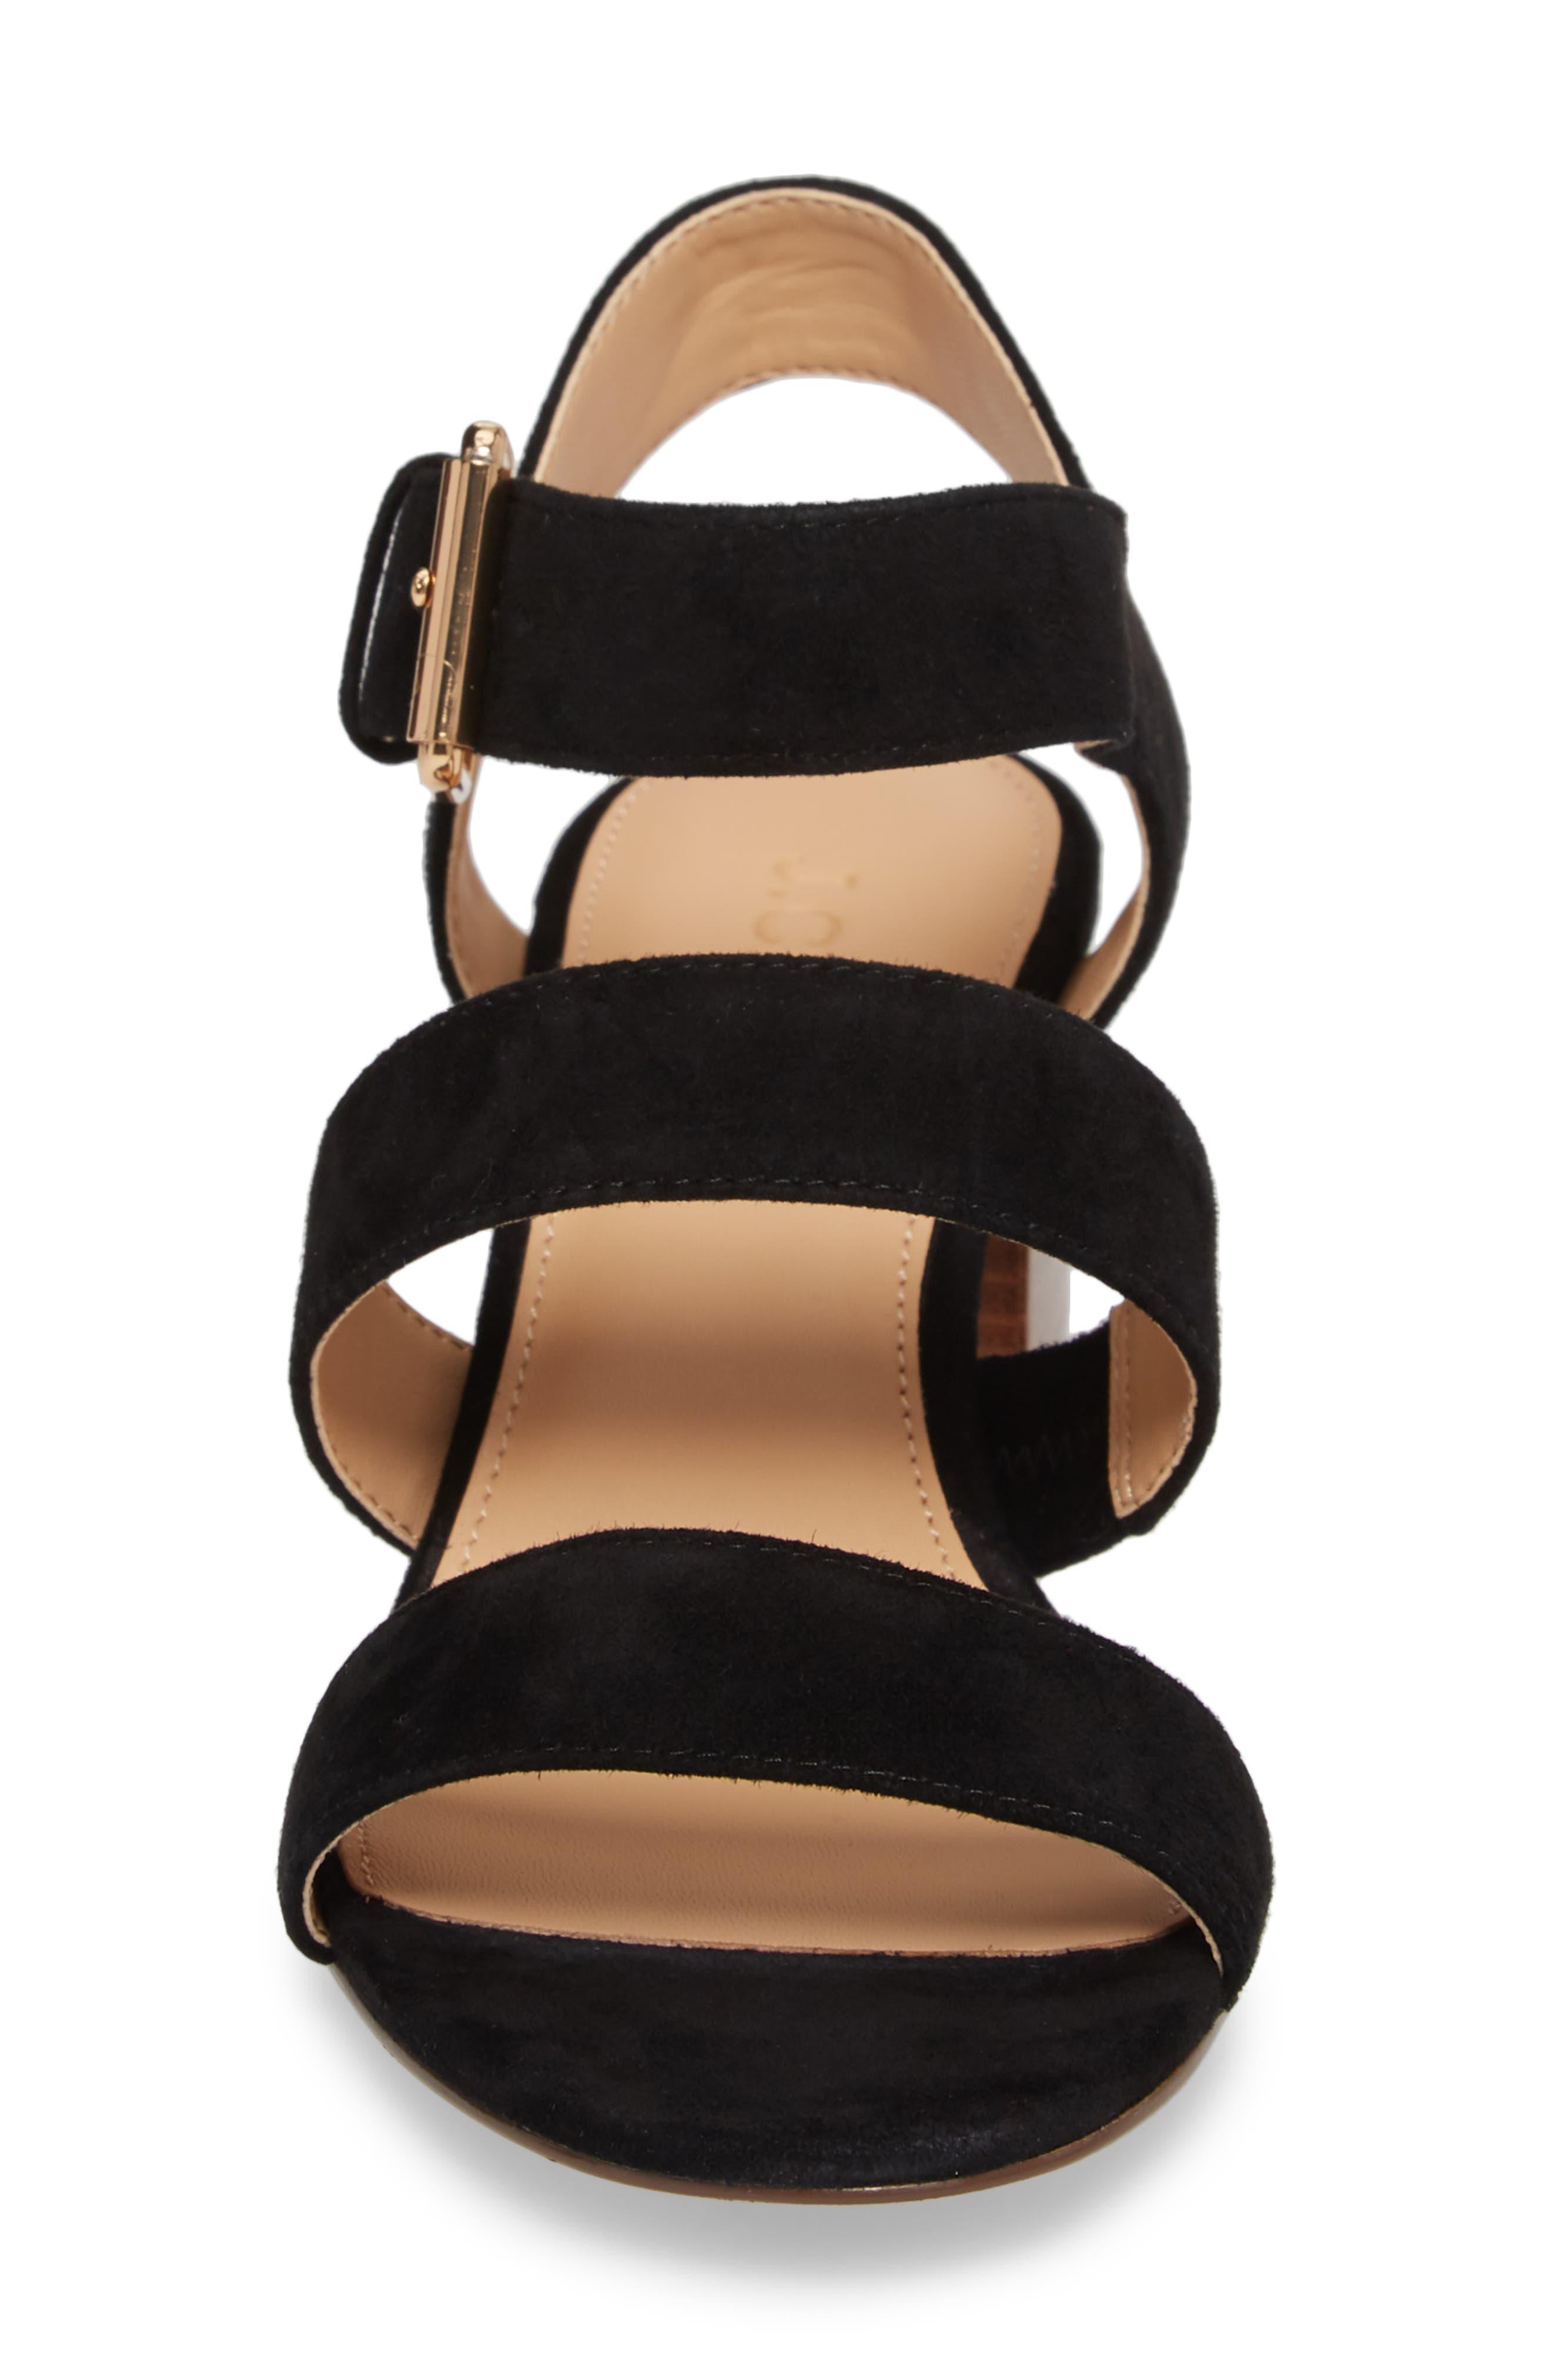 Three-Strap Suede Sandal,                             Alternate thumbnail 4, color,                             Black Suede